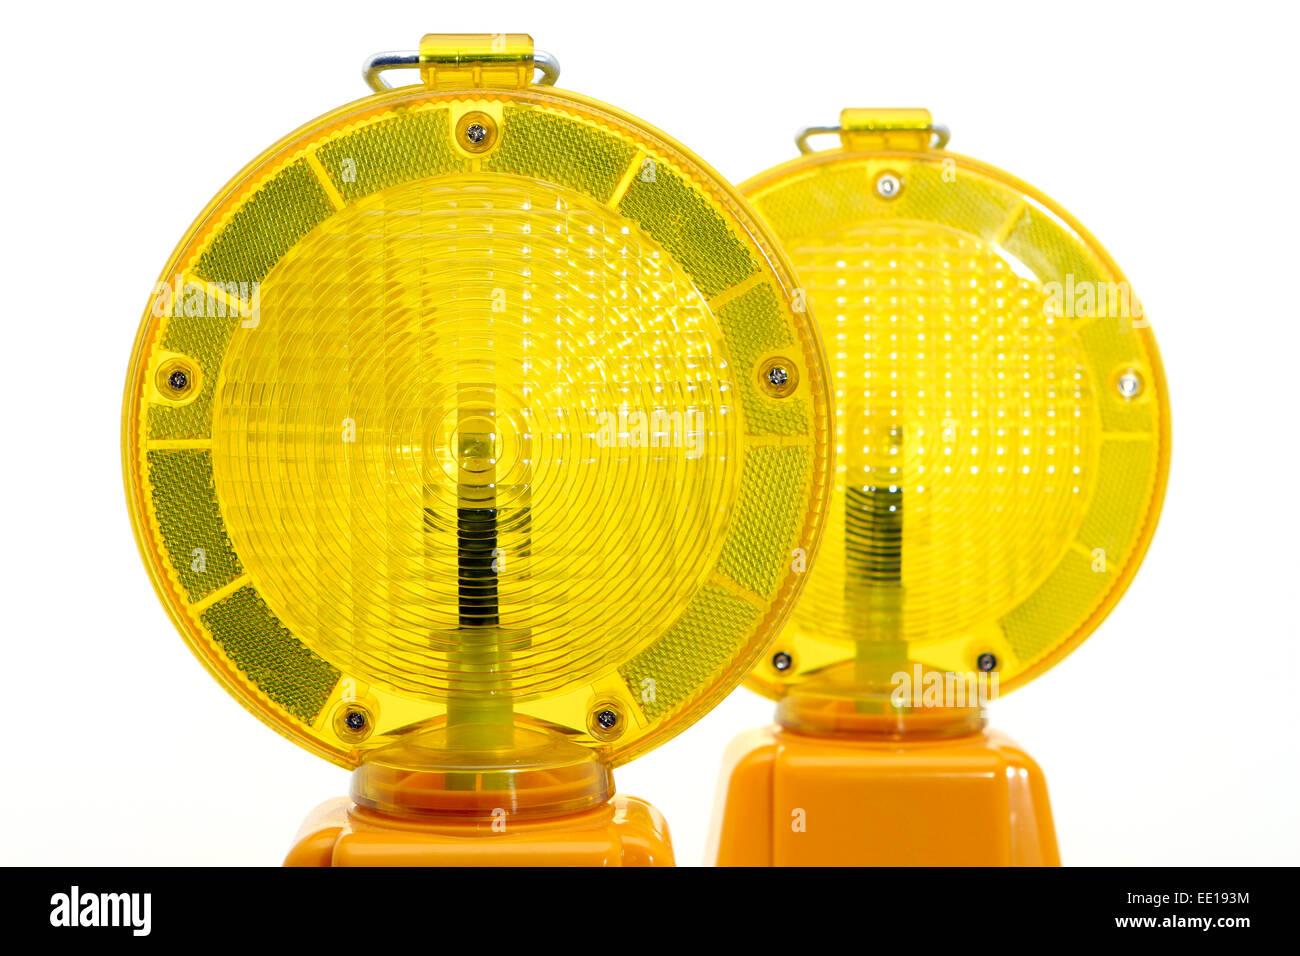 Gelbe Warnlampen Baustellenabsicherung, Banque D'Images